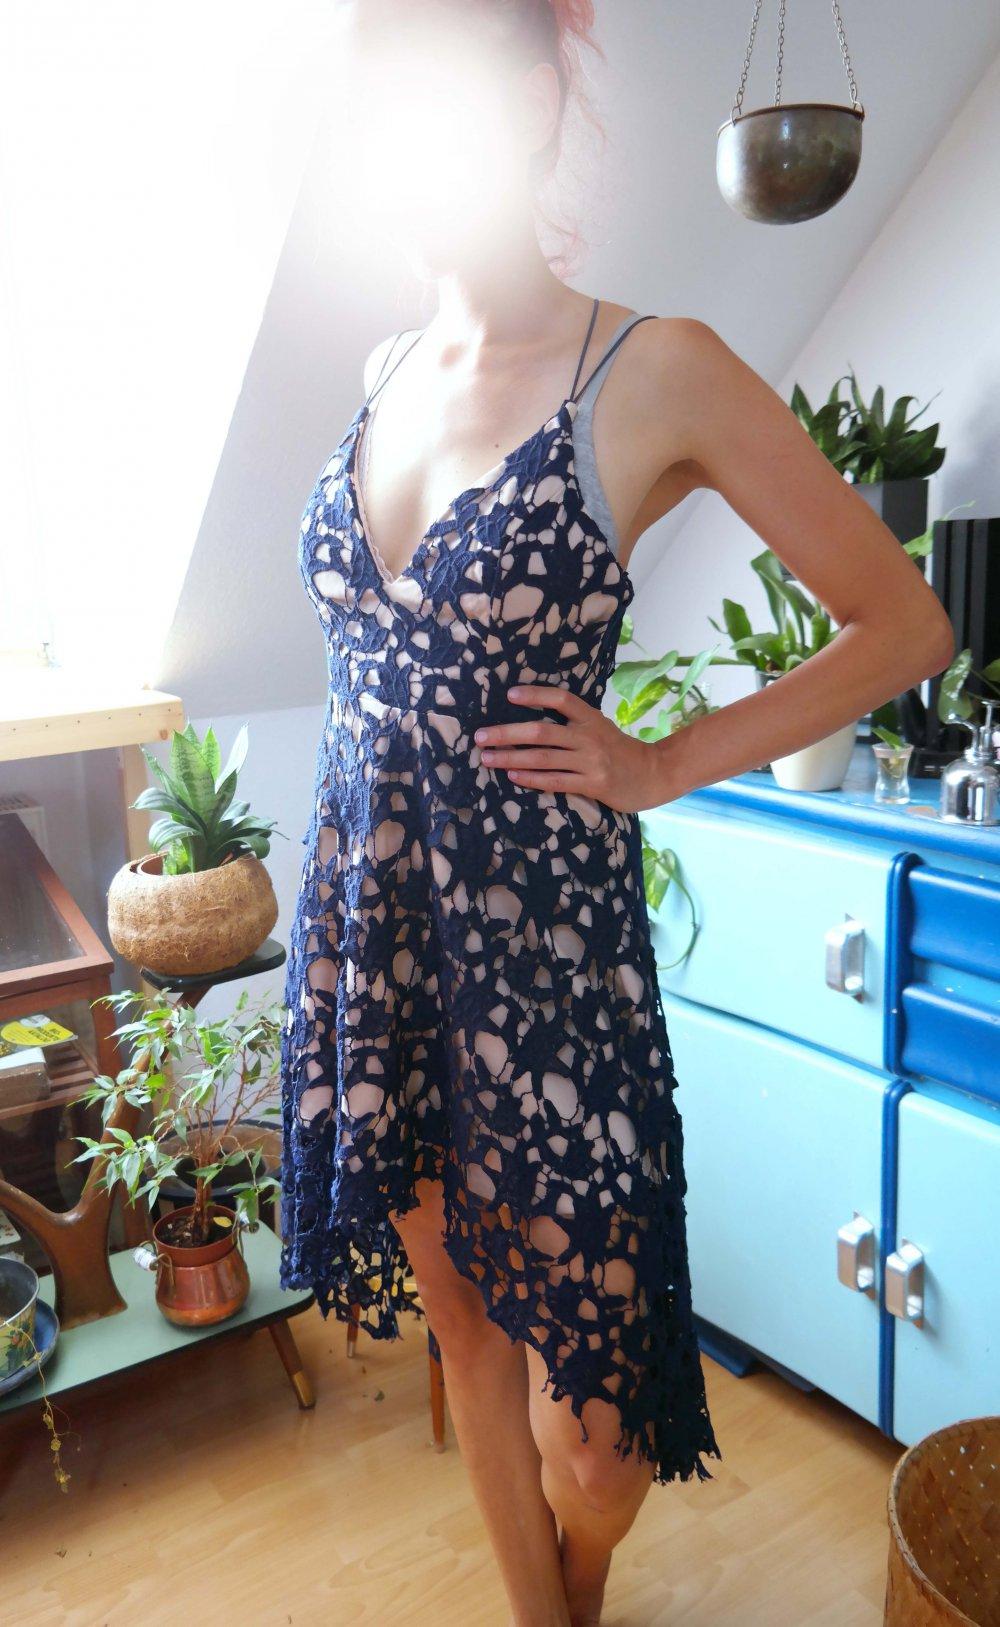 HighLow Kleid Spitzenkleid Abendkleid dunkelblau marine ...